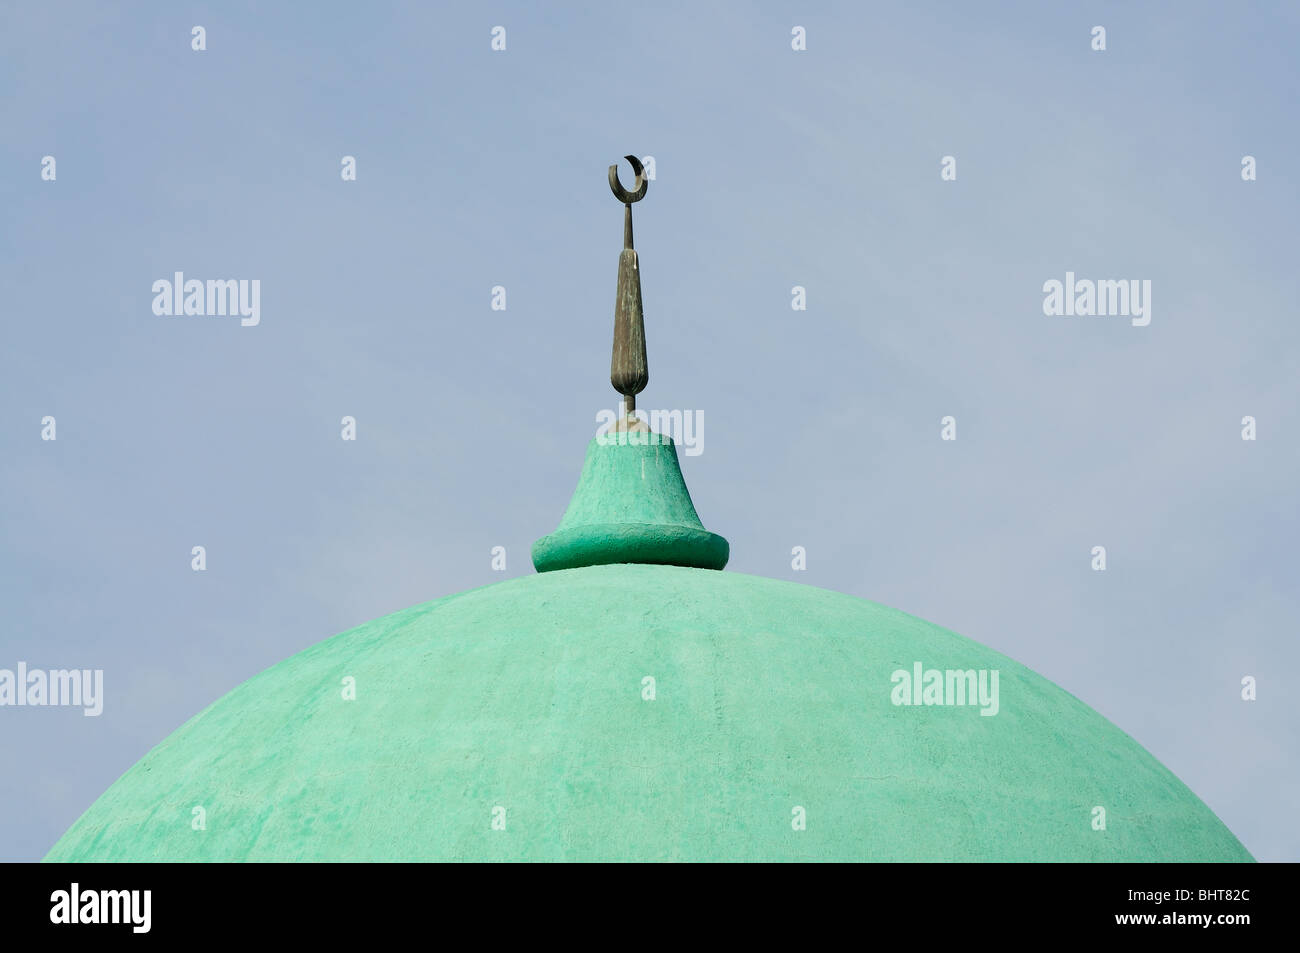 Mosque Cupola in Abu Dhabi, United Arab Emirates - Stock Image